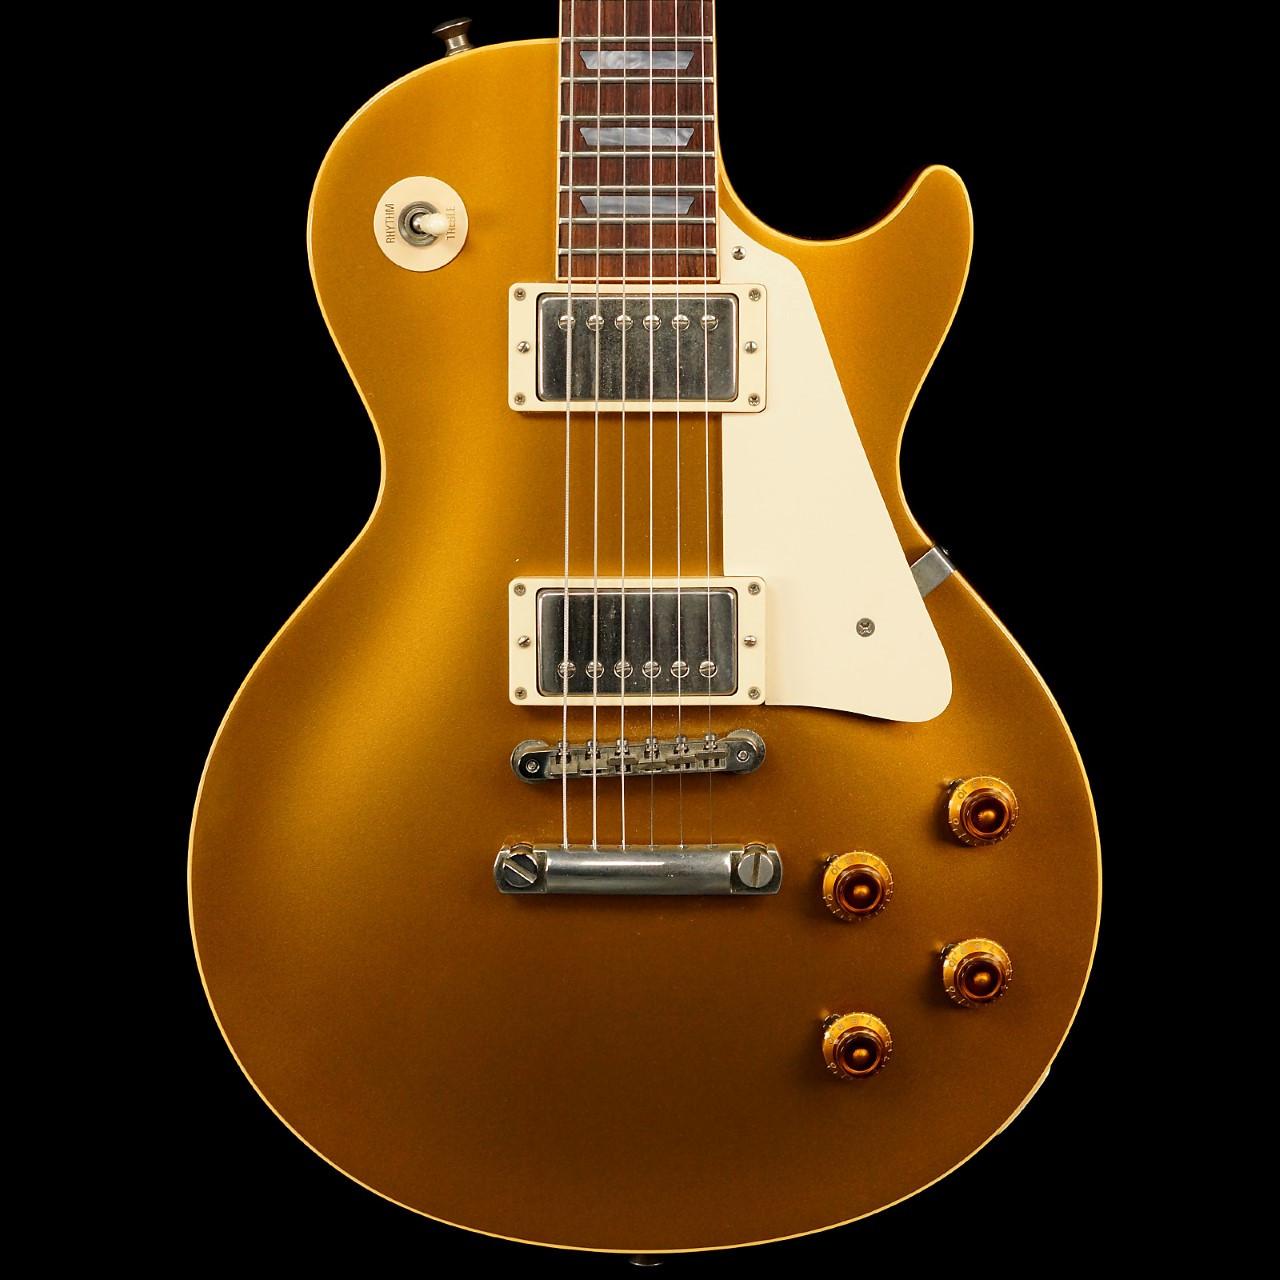 9a1c406b334 2001 Gibson Custom Shop Les Paul 1957 Historic Reissue Goldtop